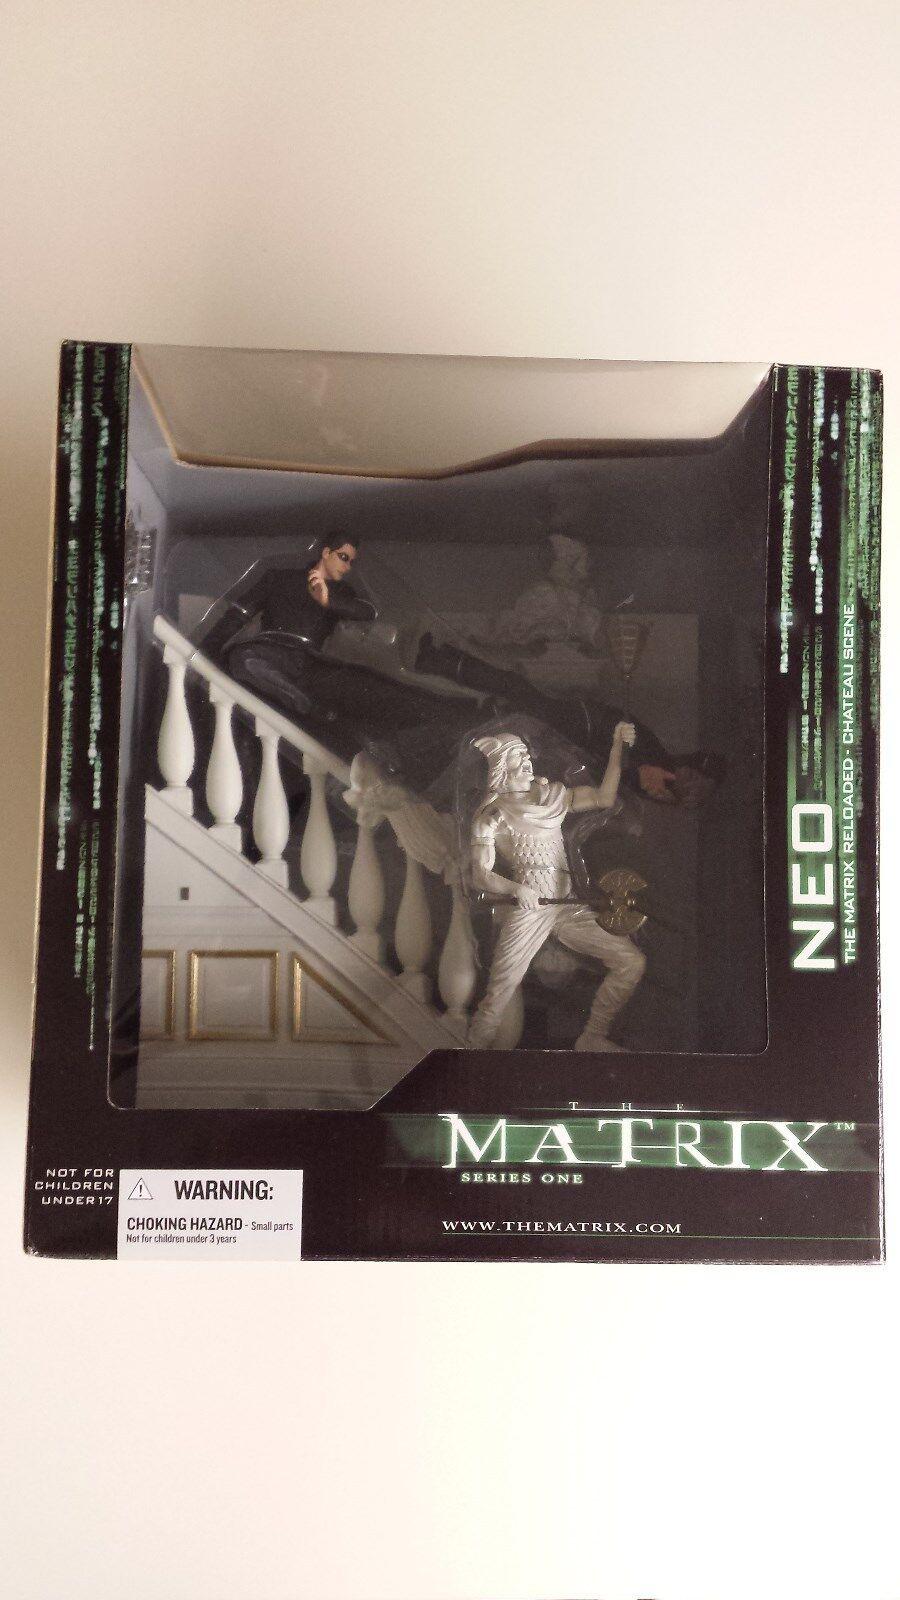 The Matrix- Neo-The Matrix Reloaded- Chateau Scene- Series1 Boxed Set MIB